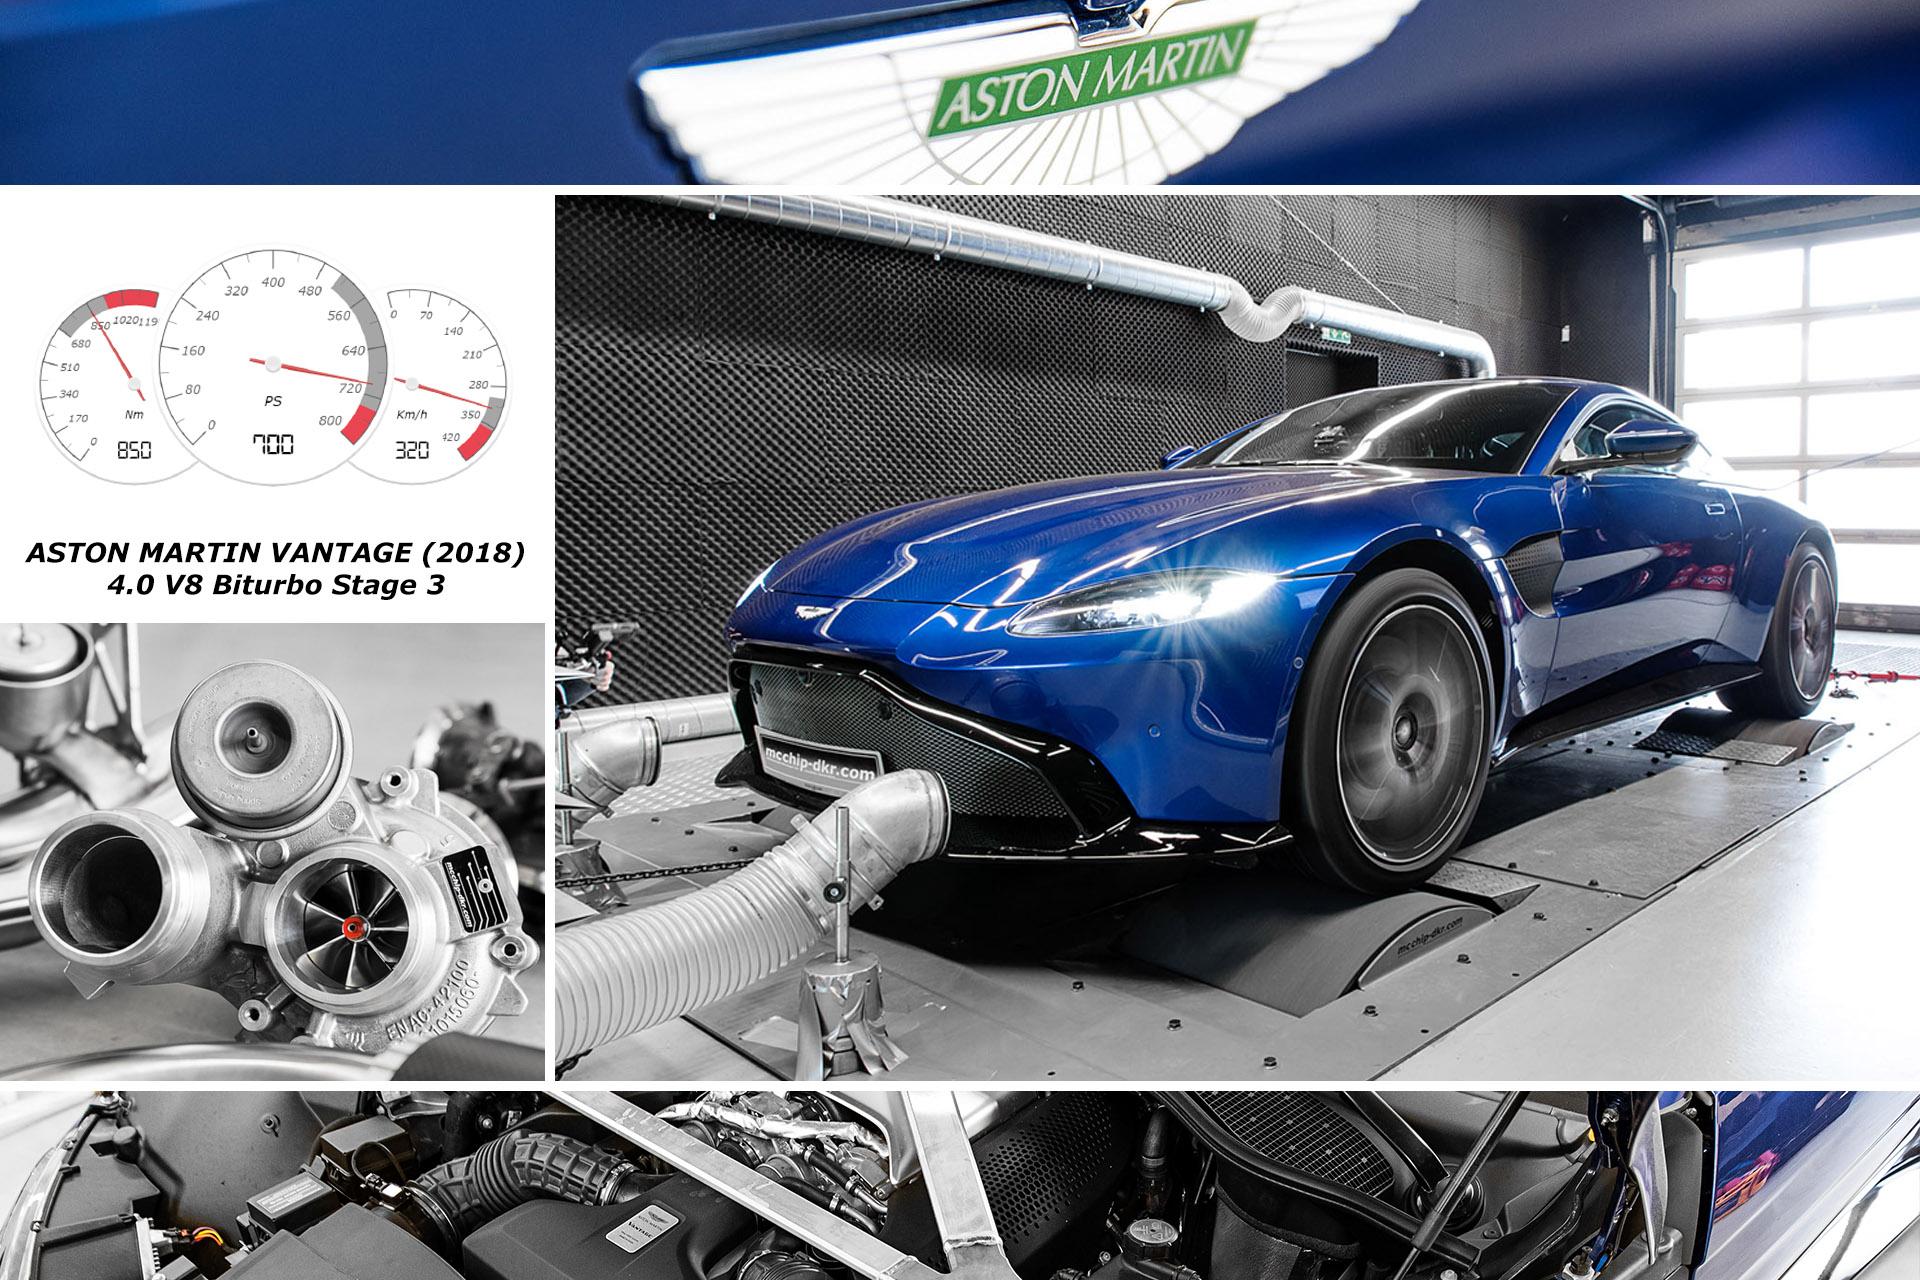 Chiptuning Performance Upgrade Aston Martin Vantage V8 2018 Stage 1 3